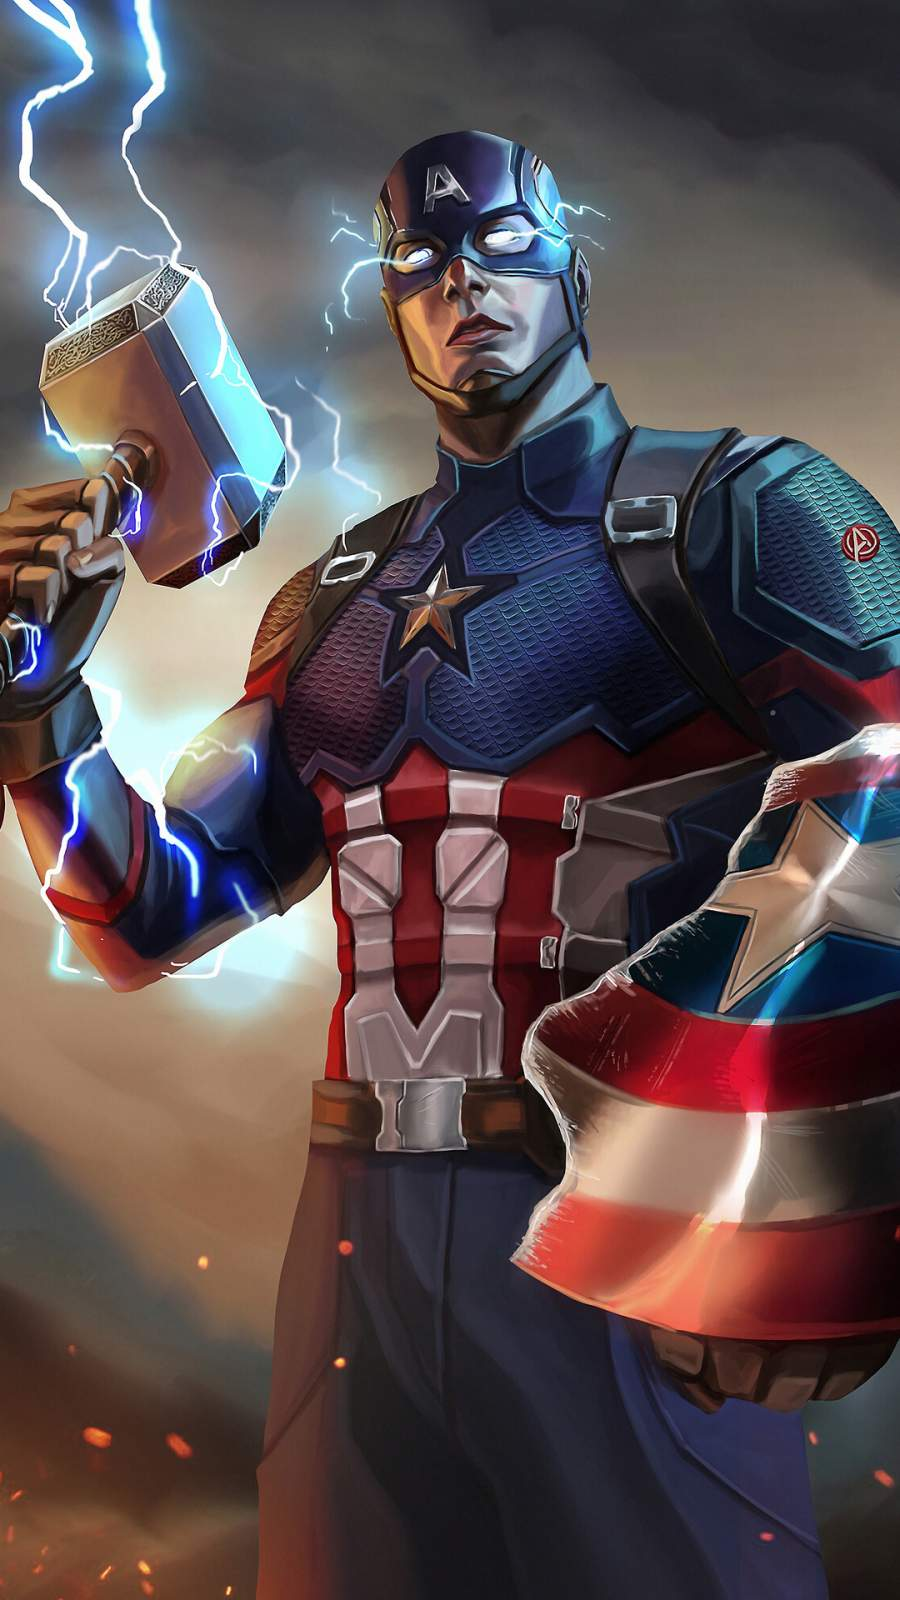 Captain America Mjolnir Artwork iPhone Wallpaper